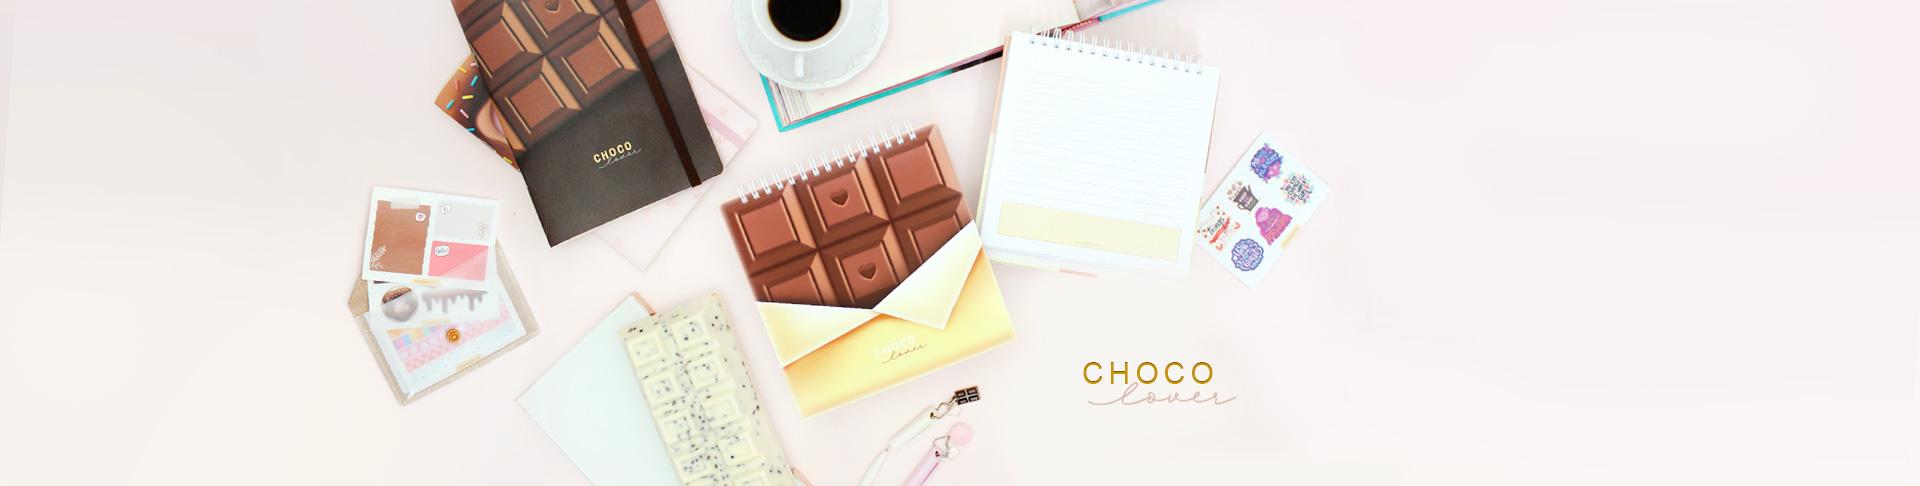 Chocolover-ownndesign2